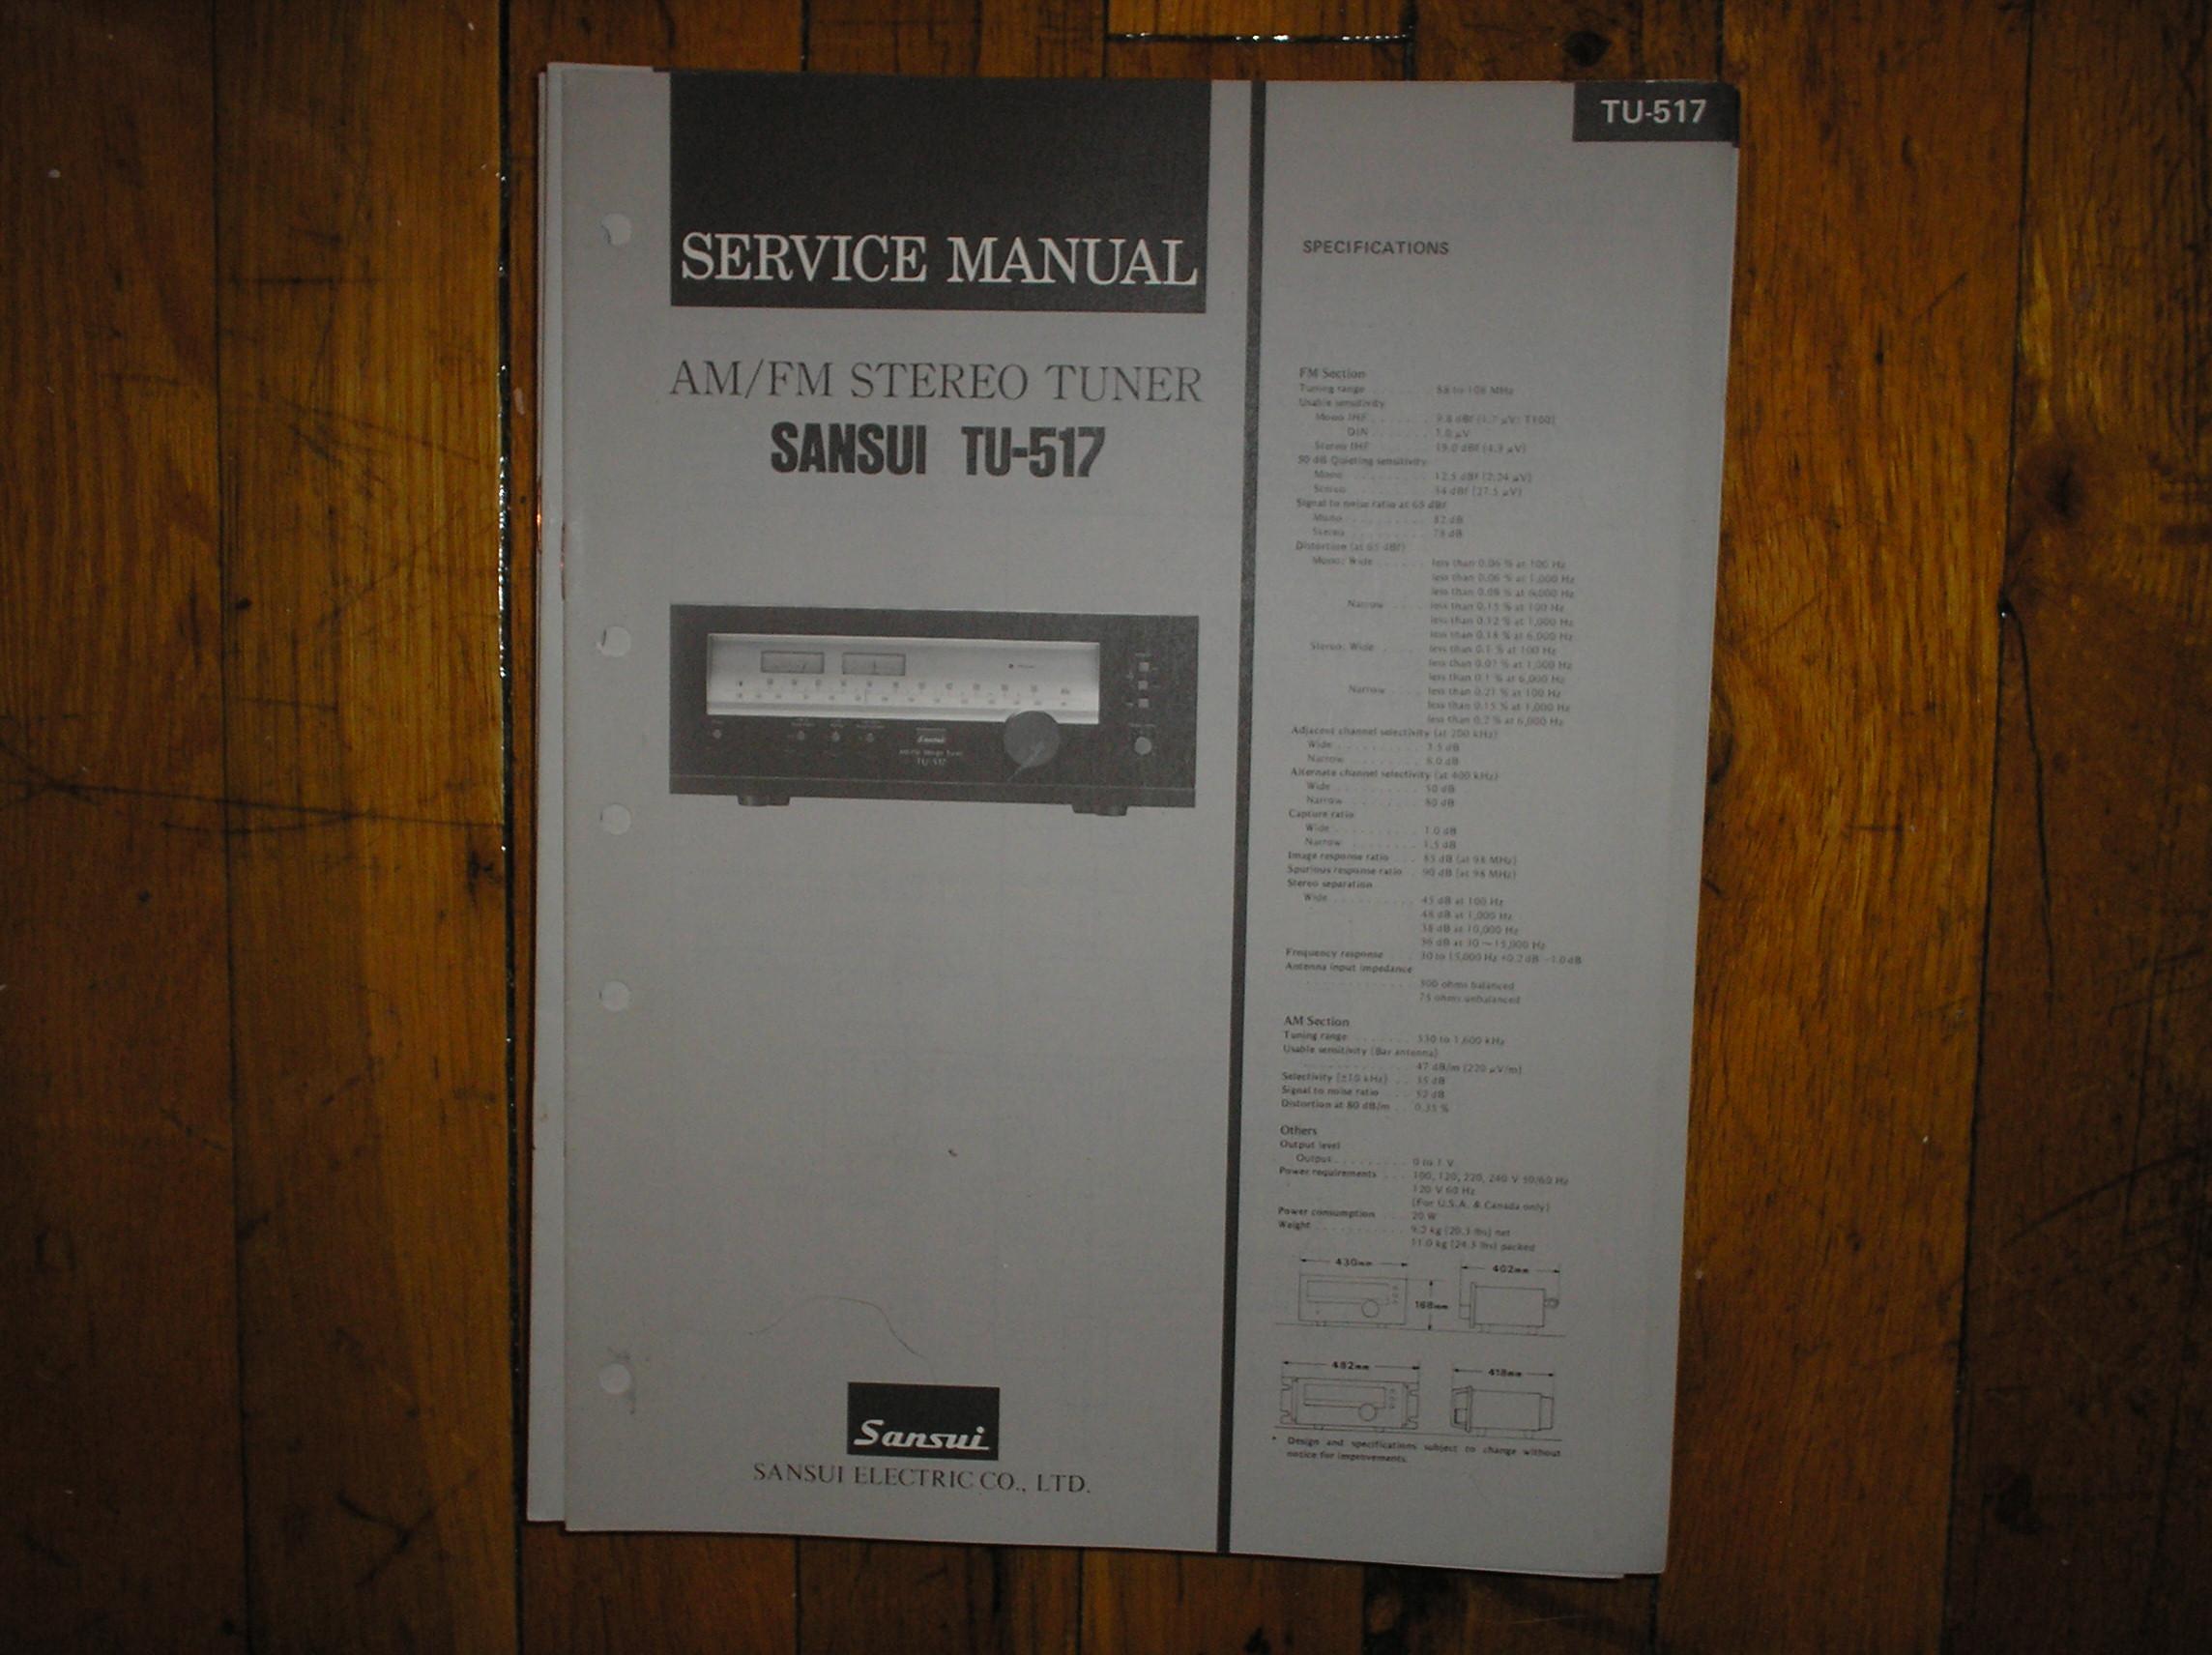 TU-517 Tuner Service Manual